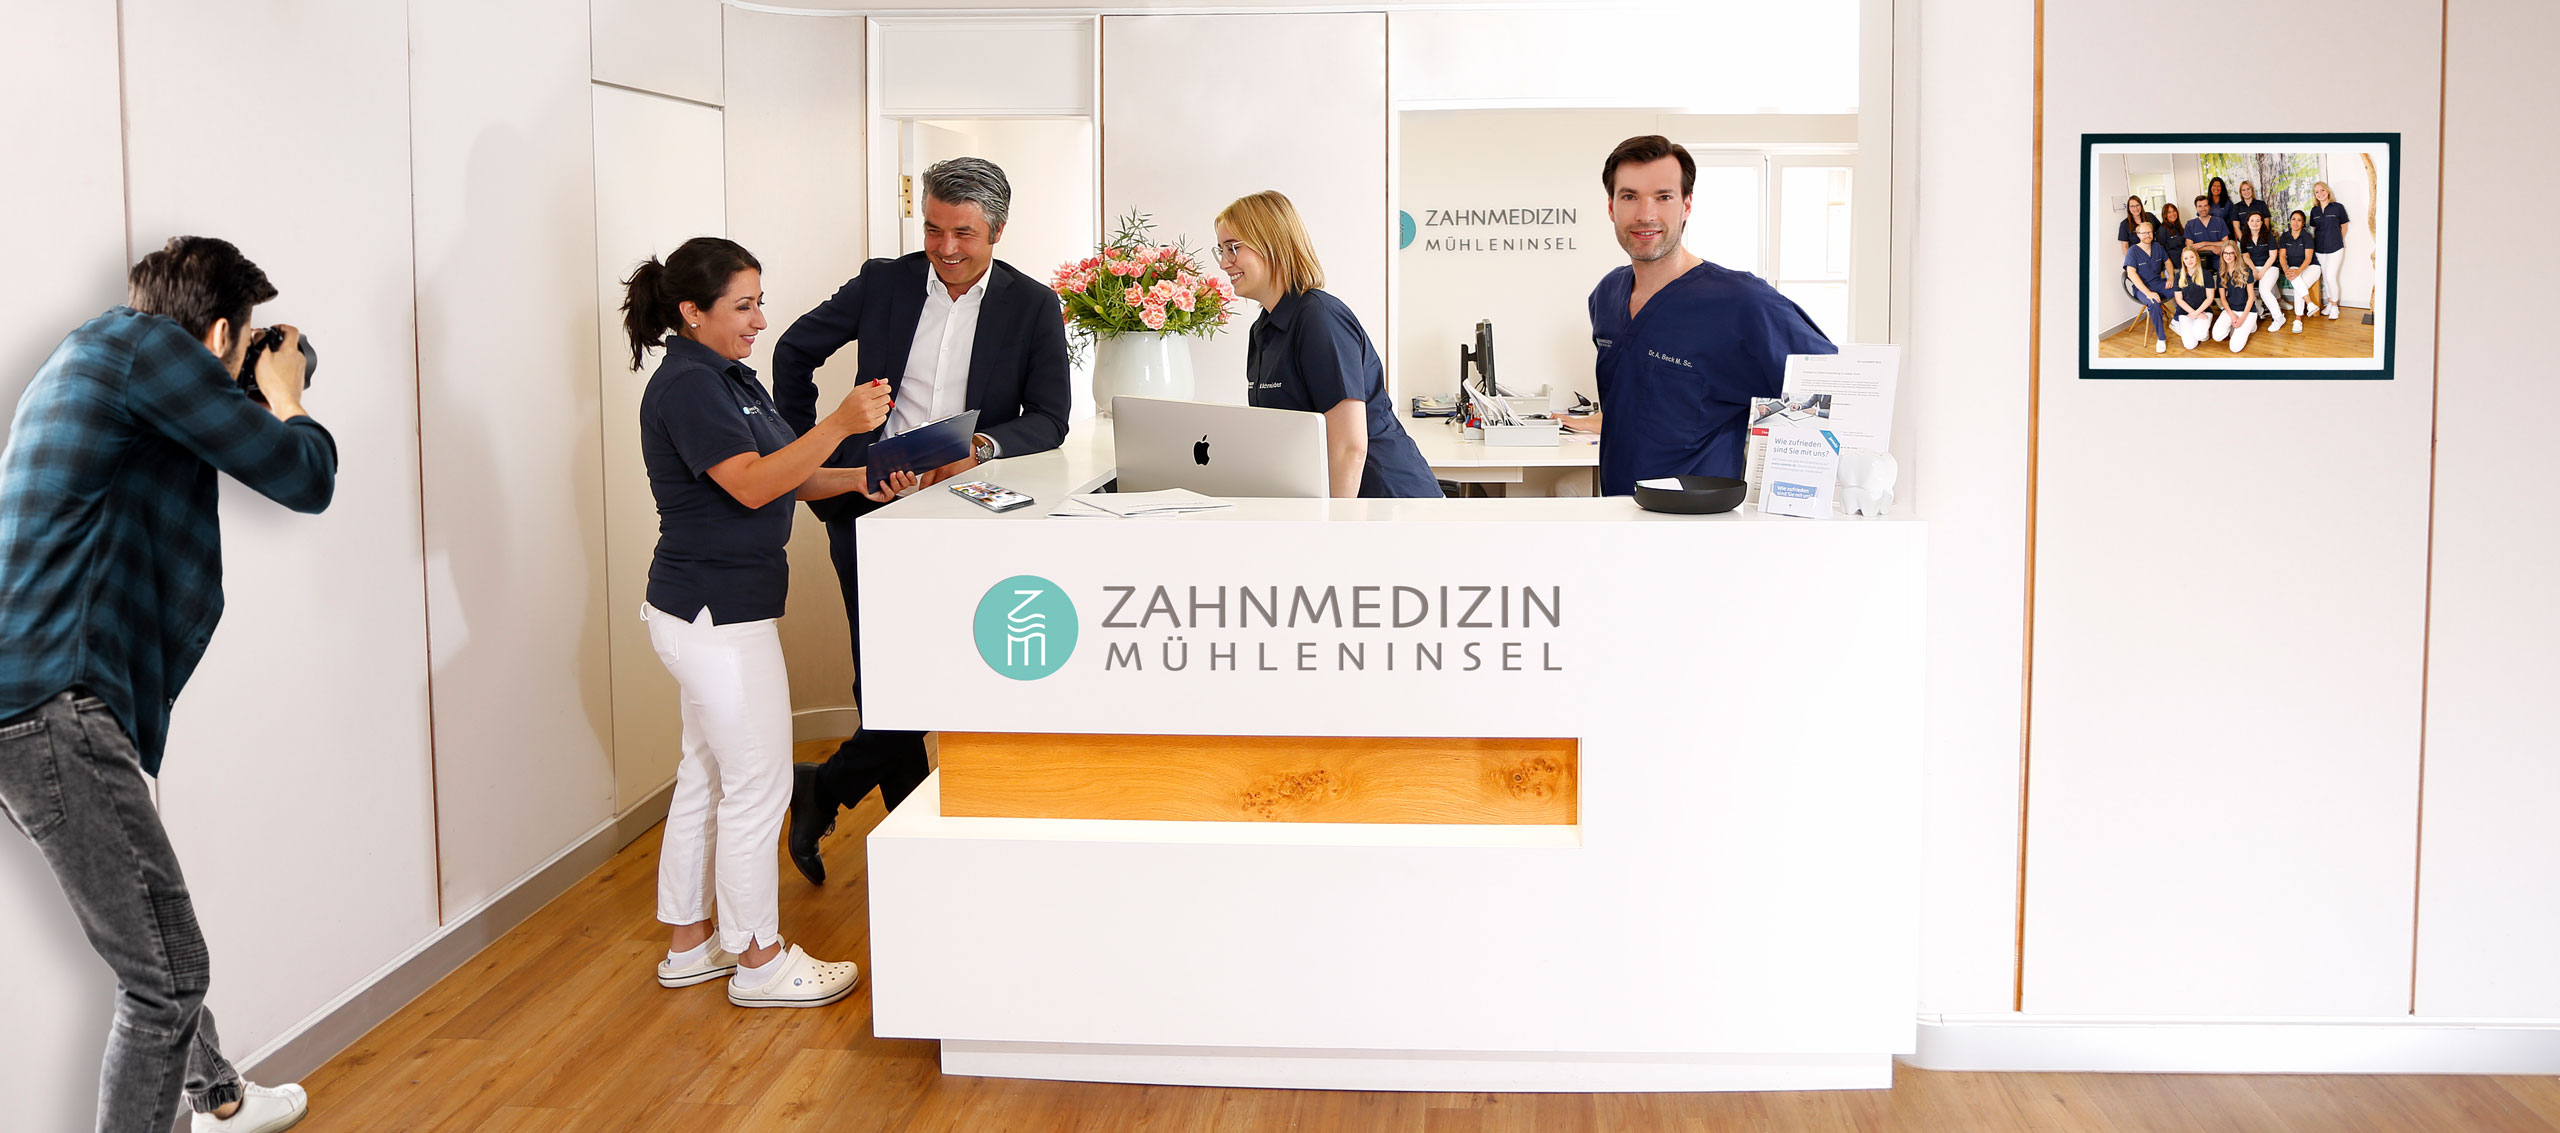 Praxismarketing, Logo, Praxisfotografie, Social Media an der Rezeption von Zahnarztpraxis Mühleninsel